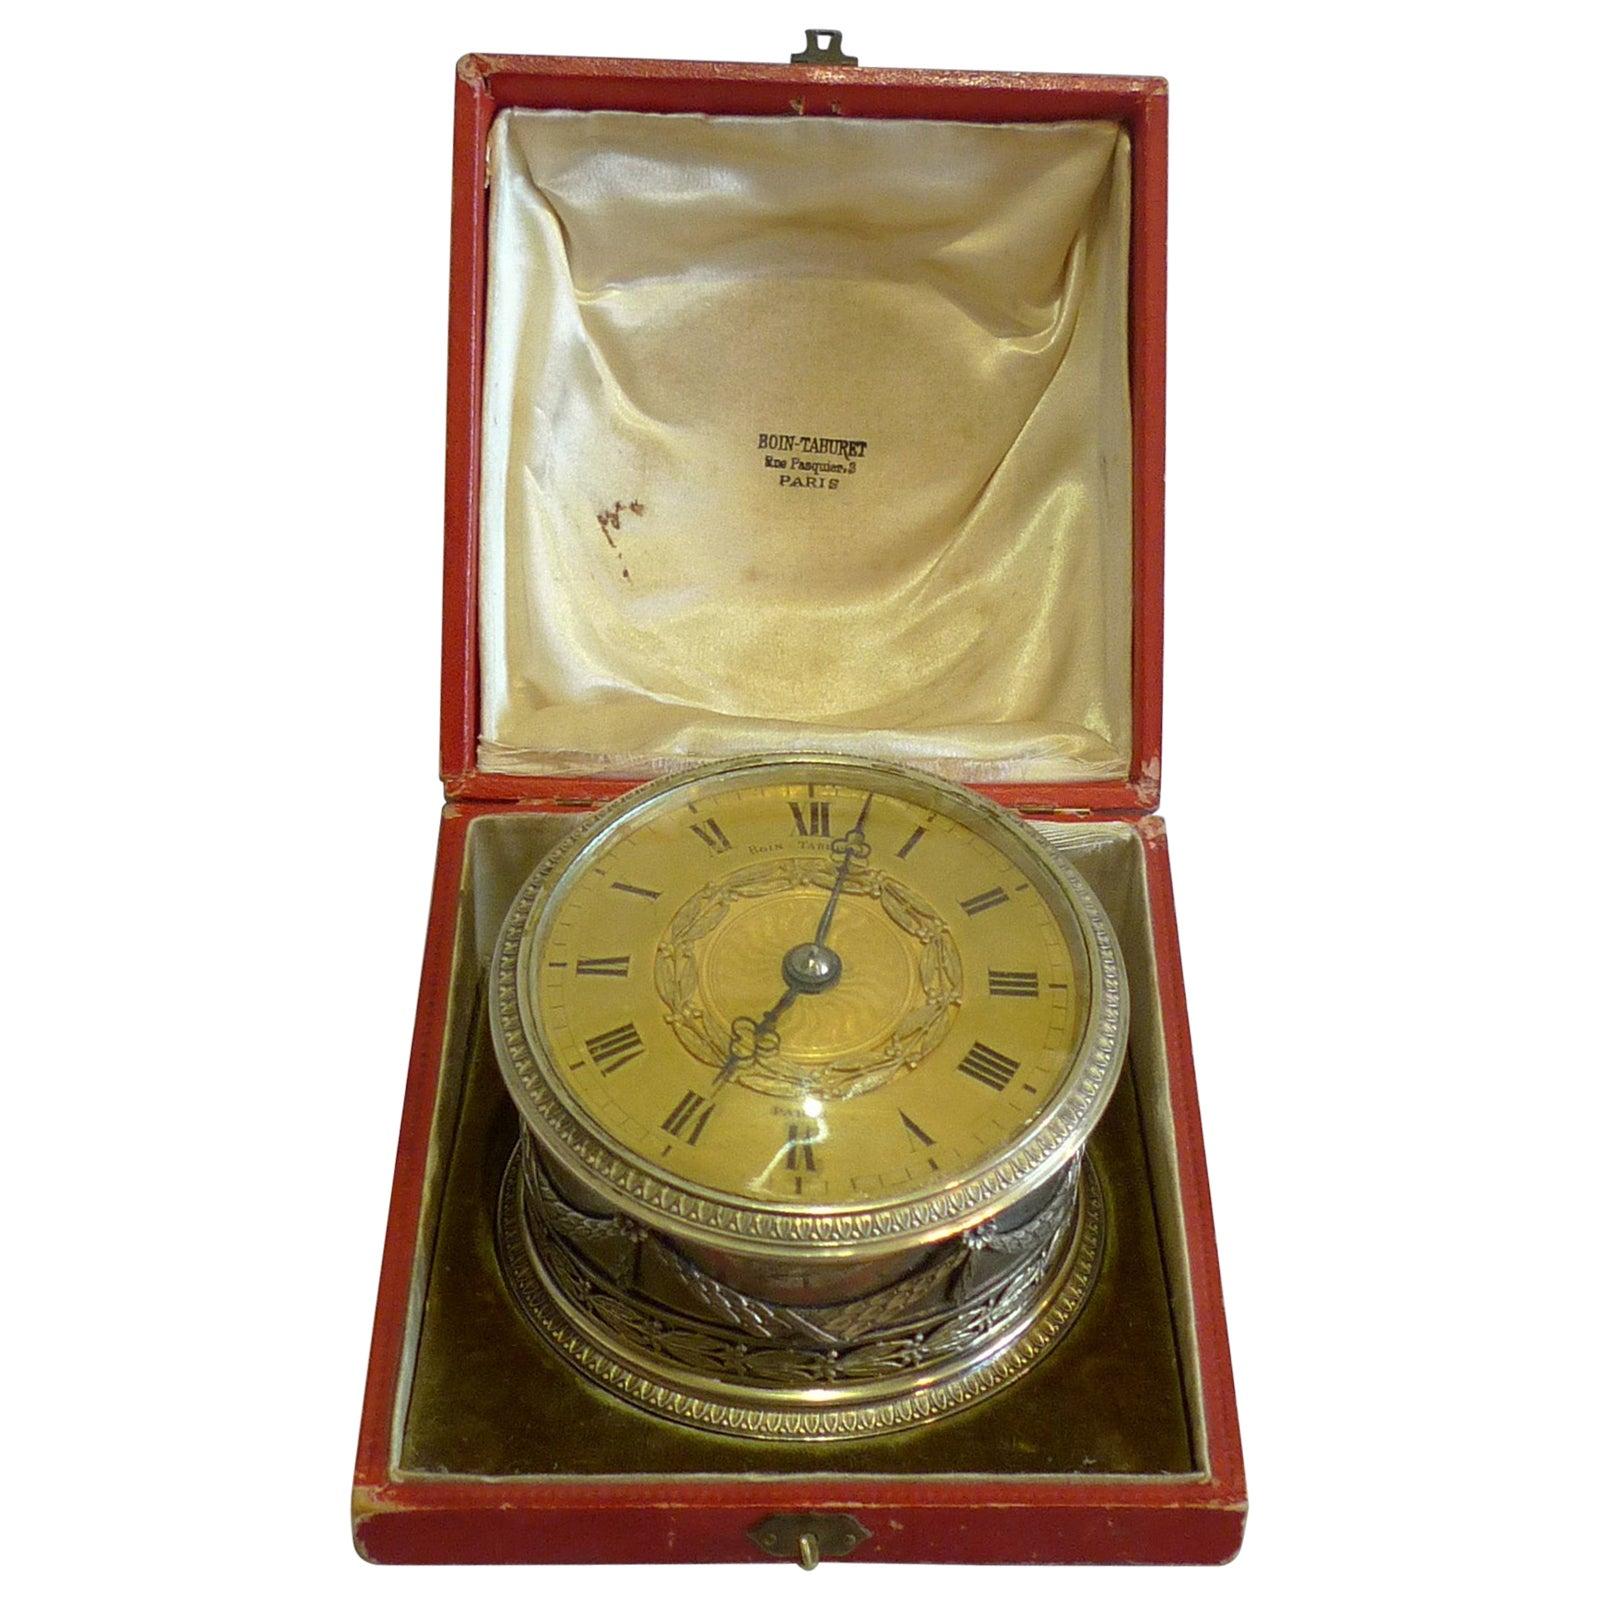 French Silver Desk Clock by Boin-Taburet, Paris, in Original Case